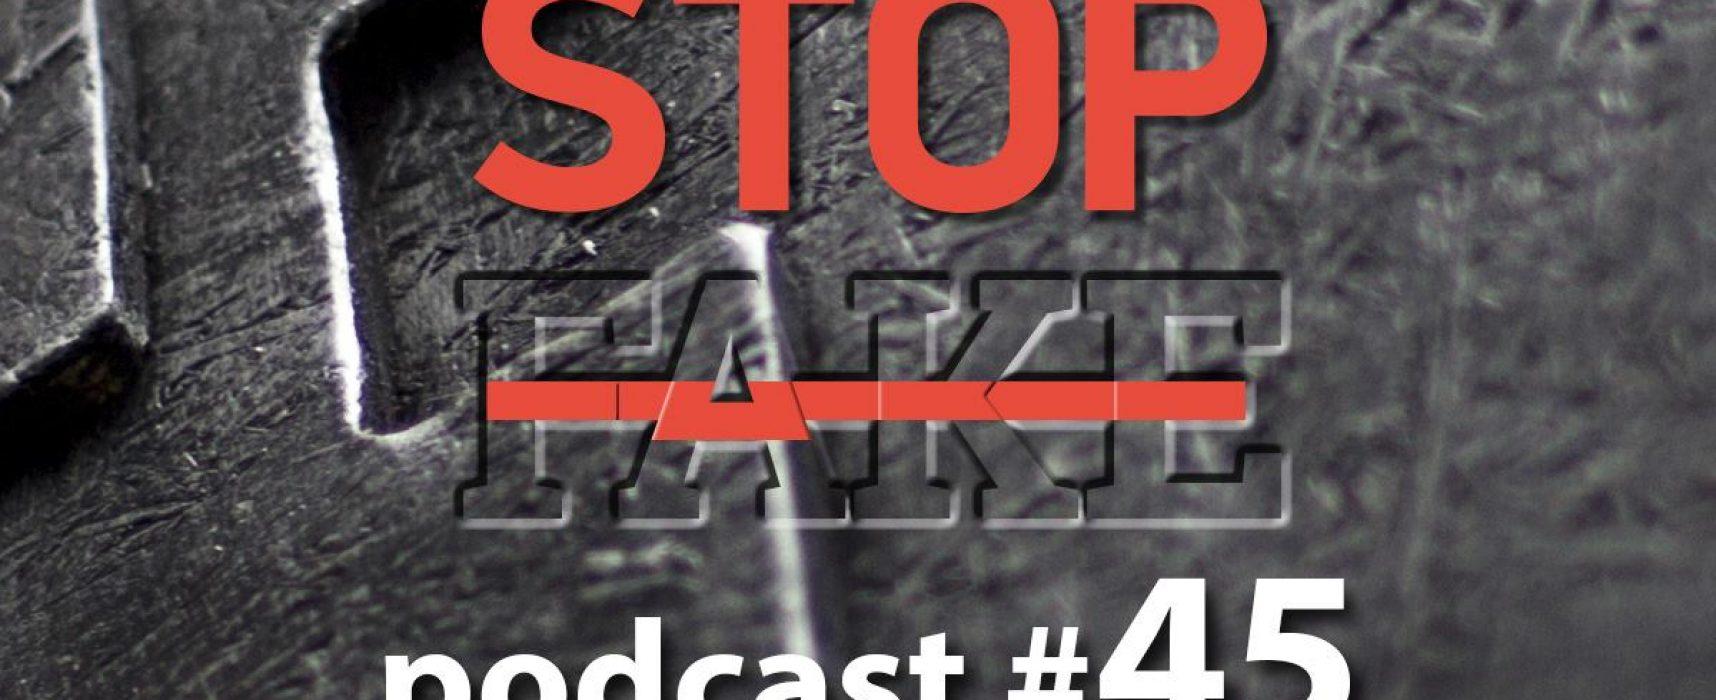 StopFake podcast #45